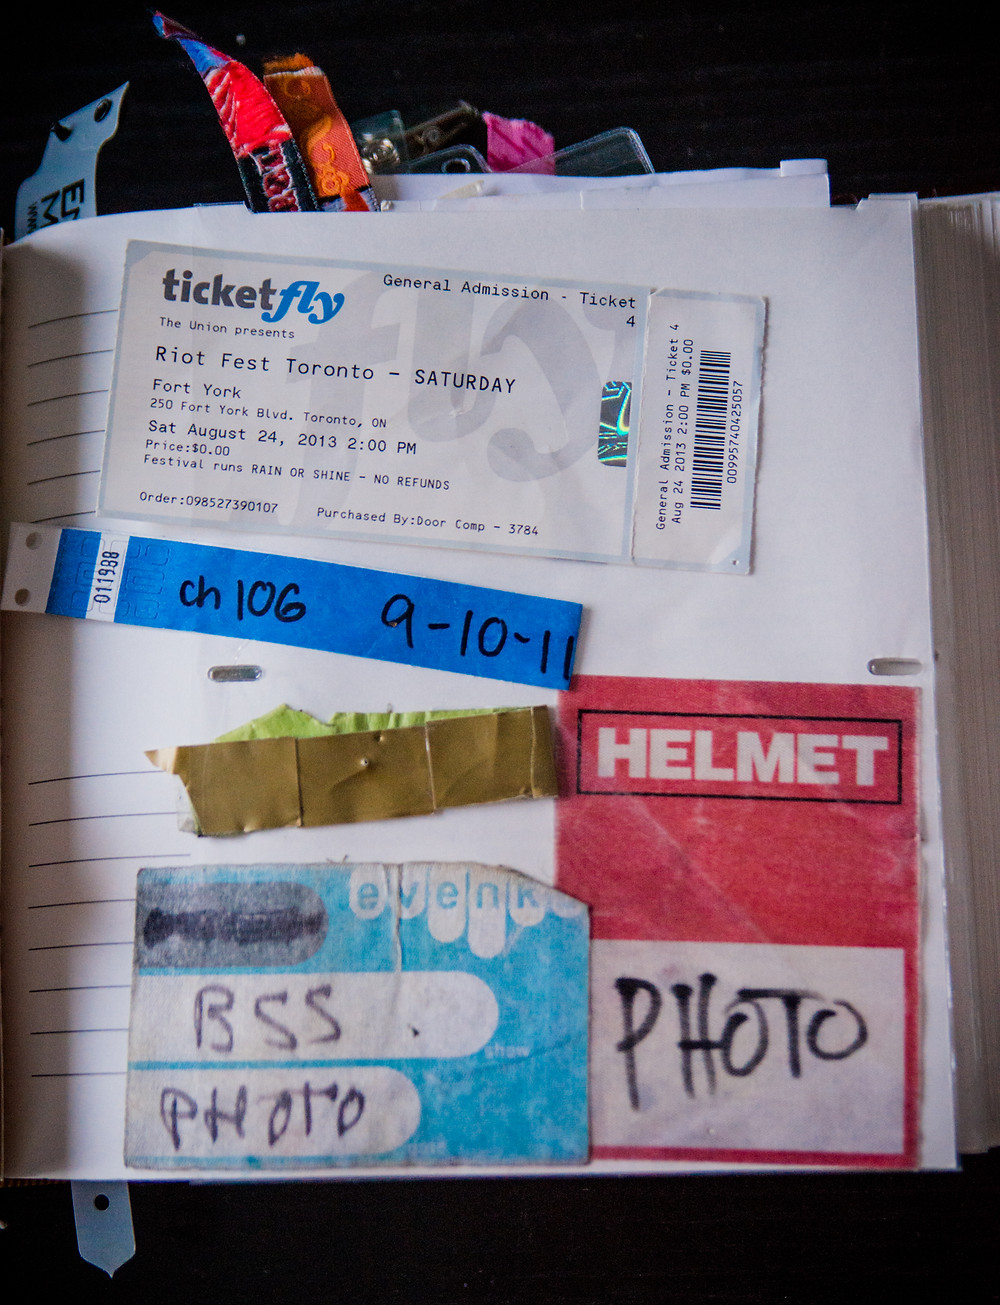 riot fest toronto 2013 ticket - Helmet photo pass - Broken Social Scene pass